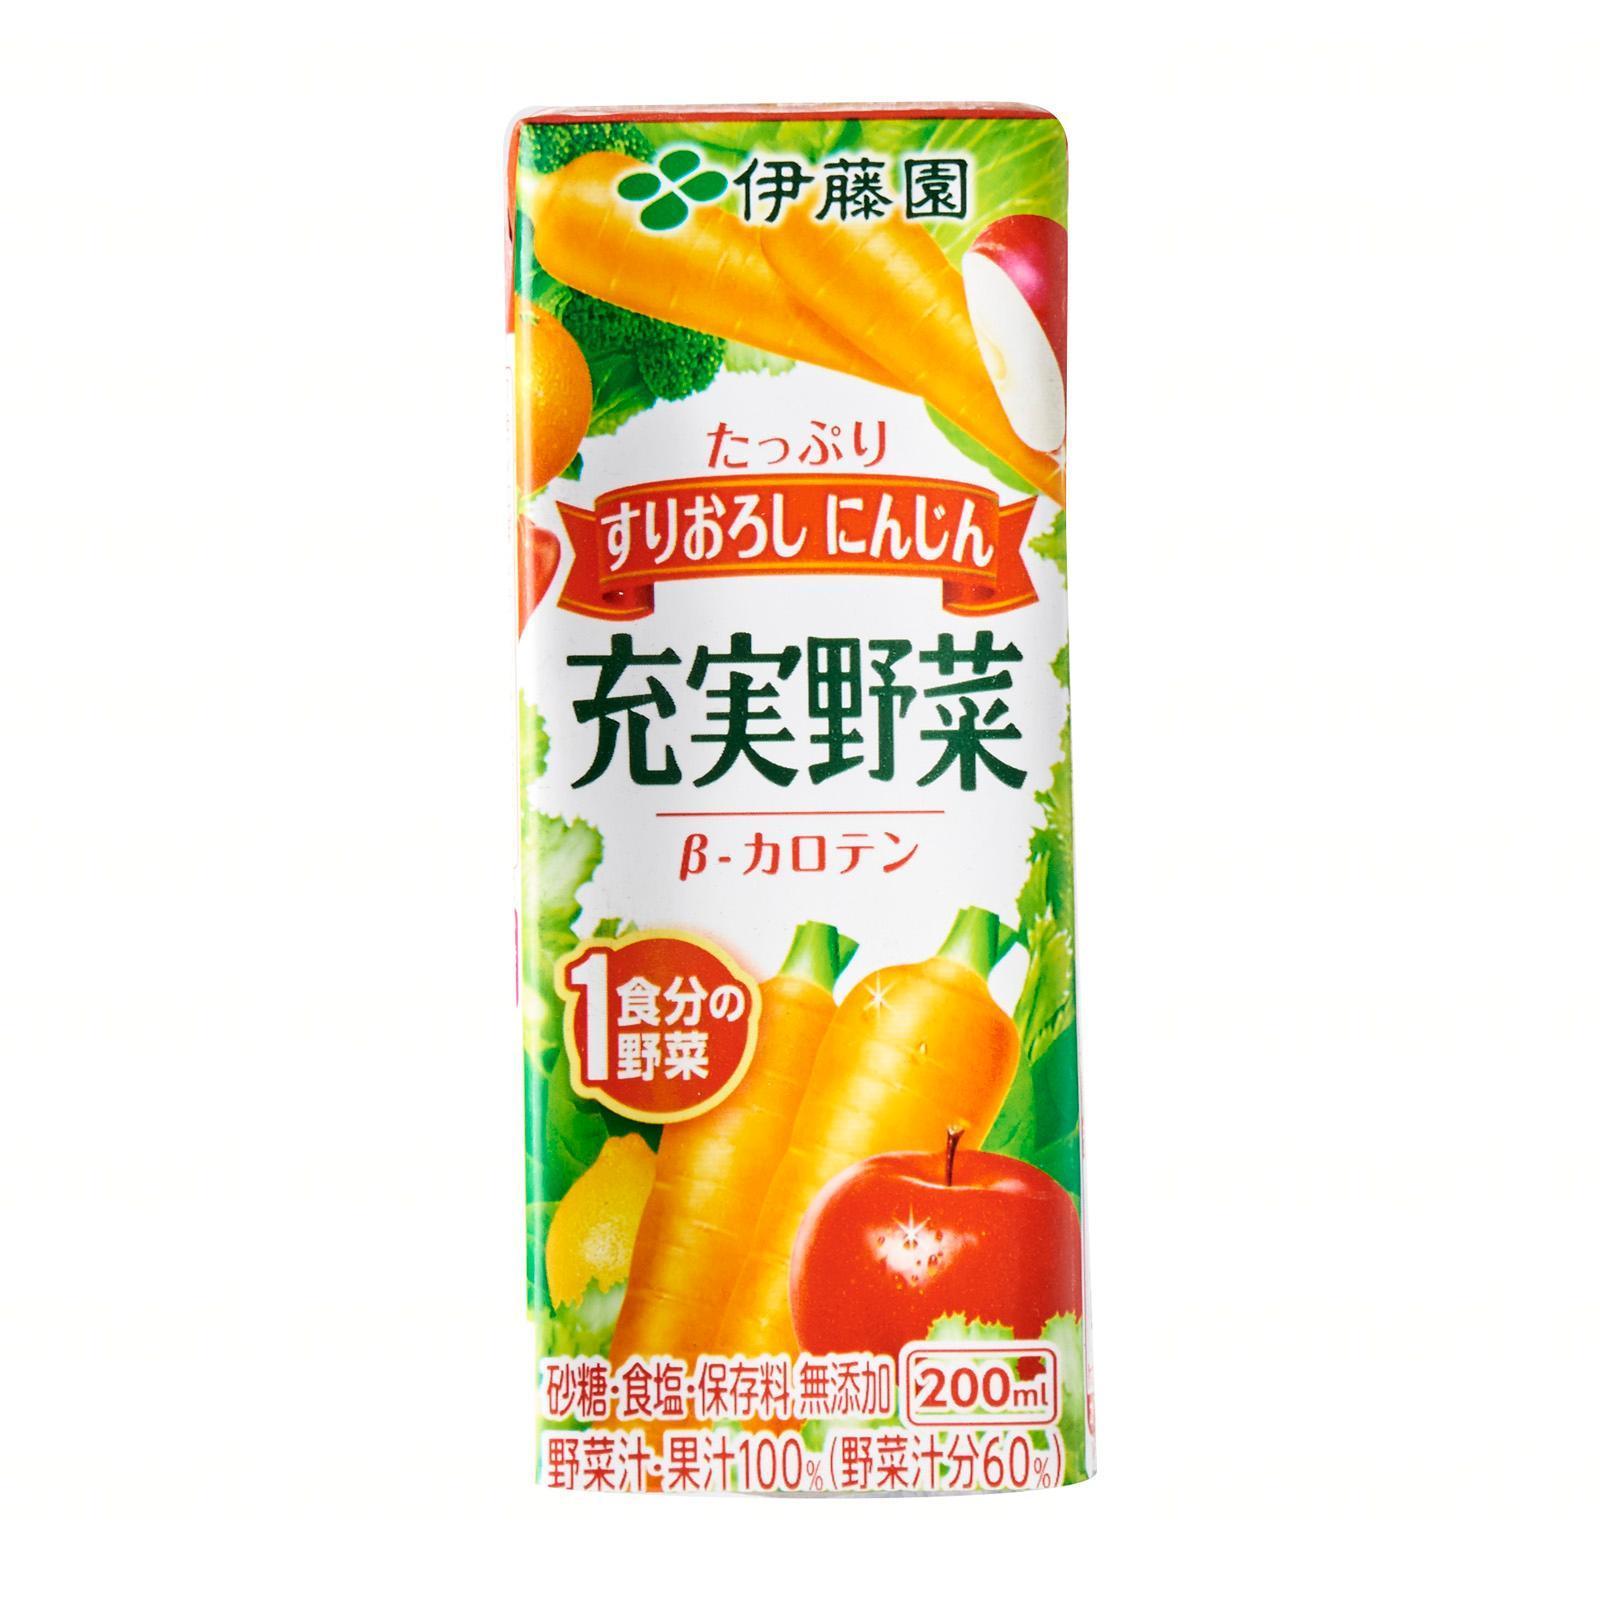 ITO EN Vegetable And Fruit Juice (Jujitsu Yasai) Vegetable Juice